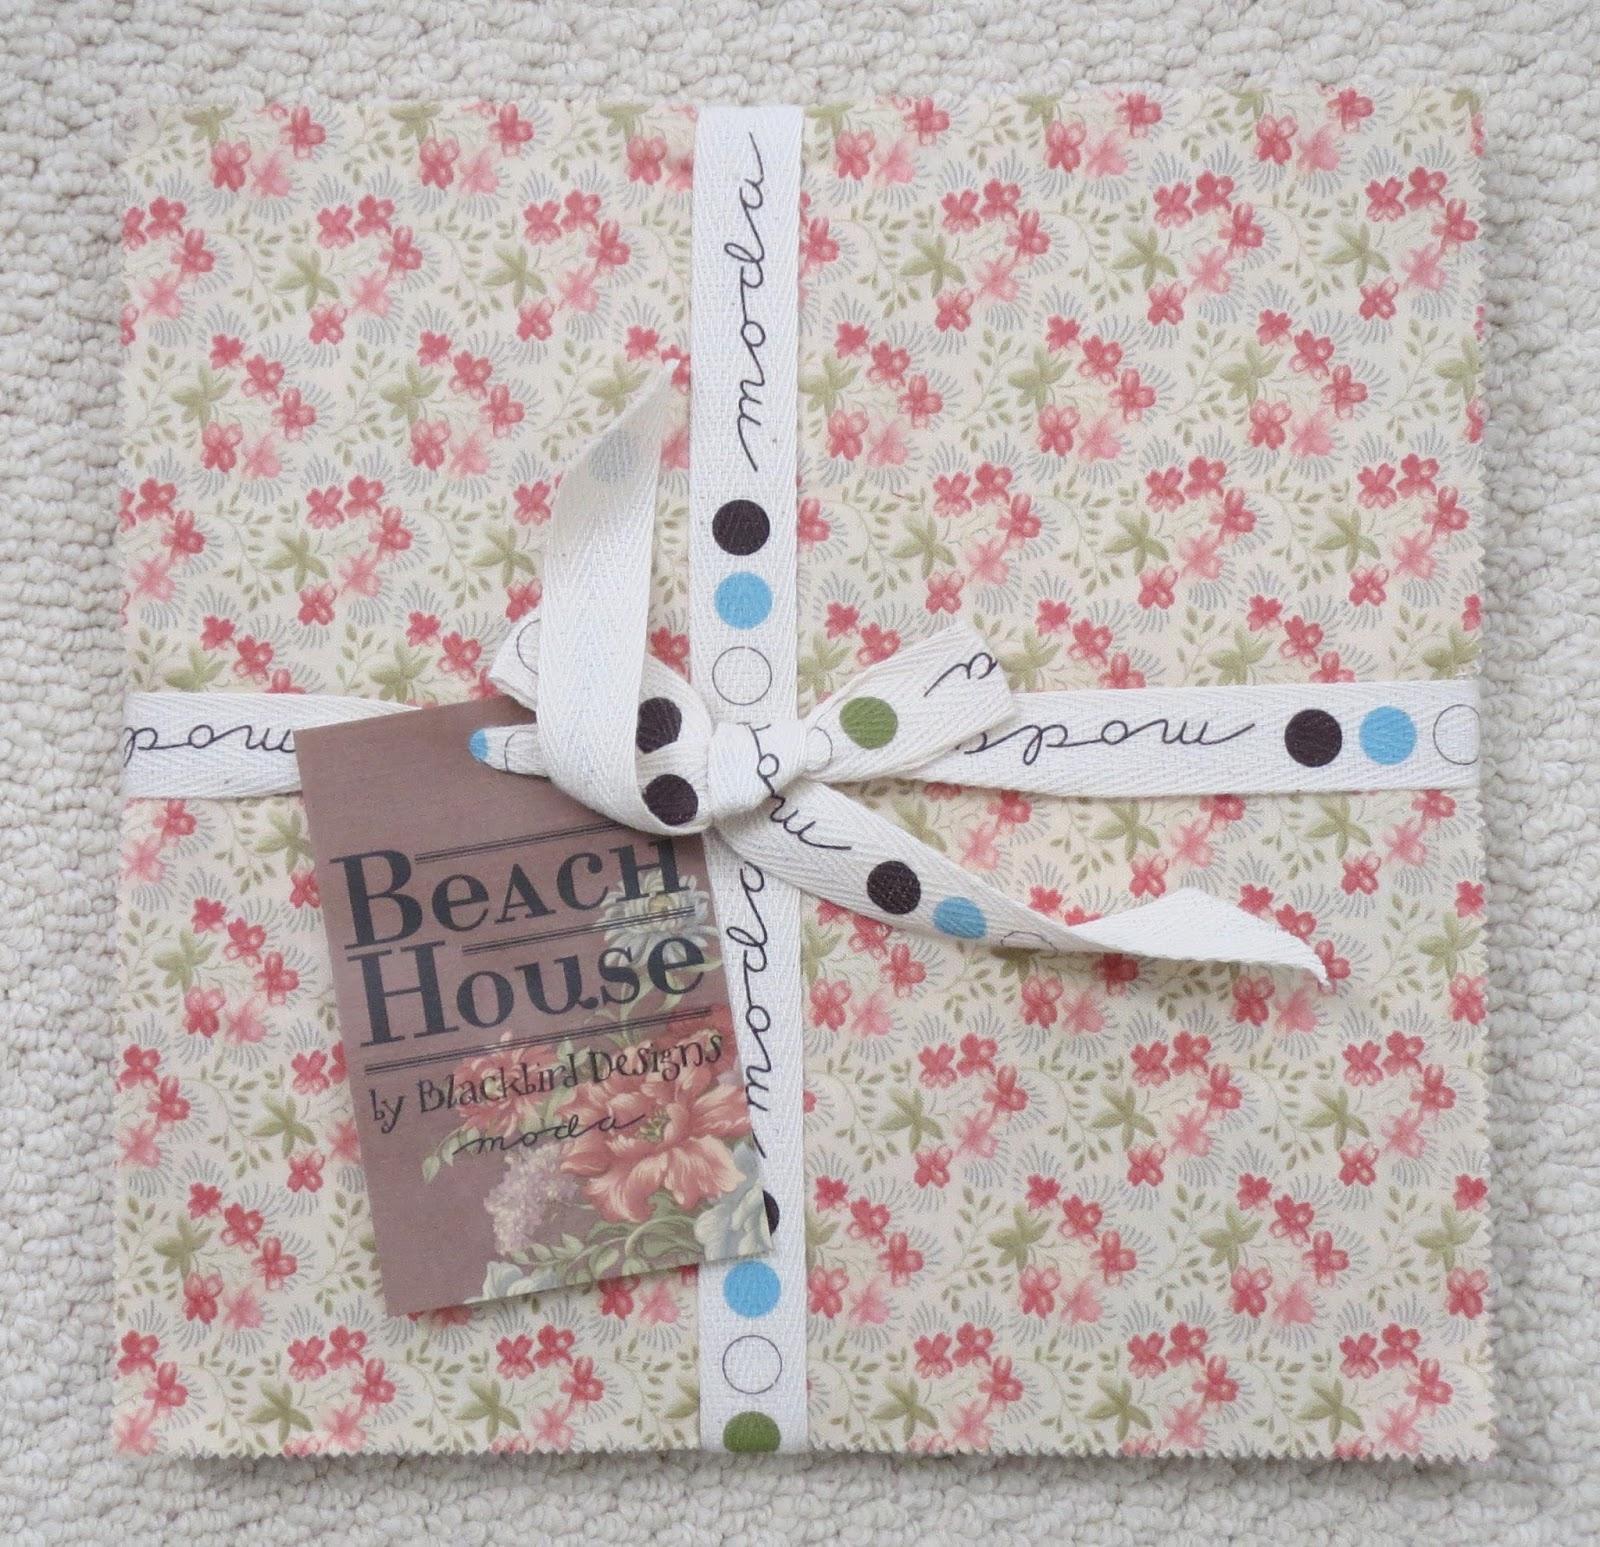 Beach house fabric blackbird designs house design for Garden party fabric by blackbird designs